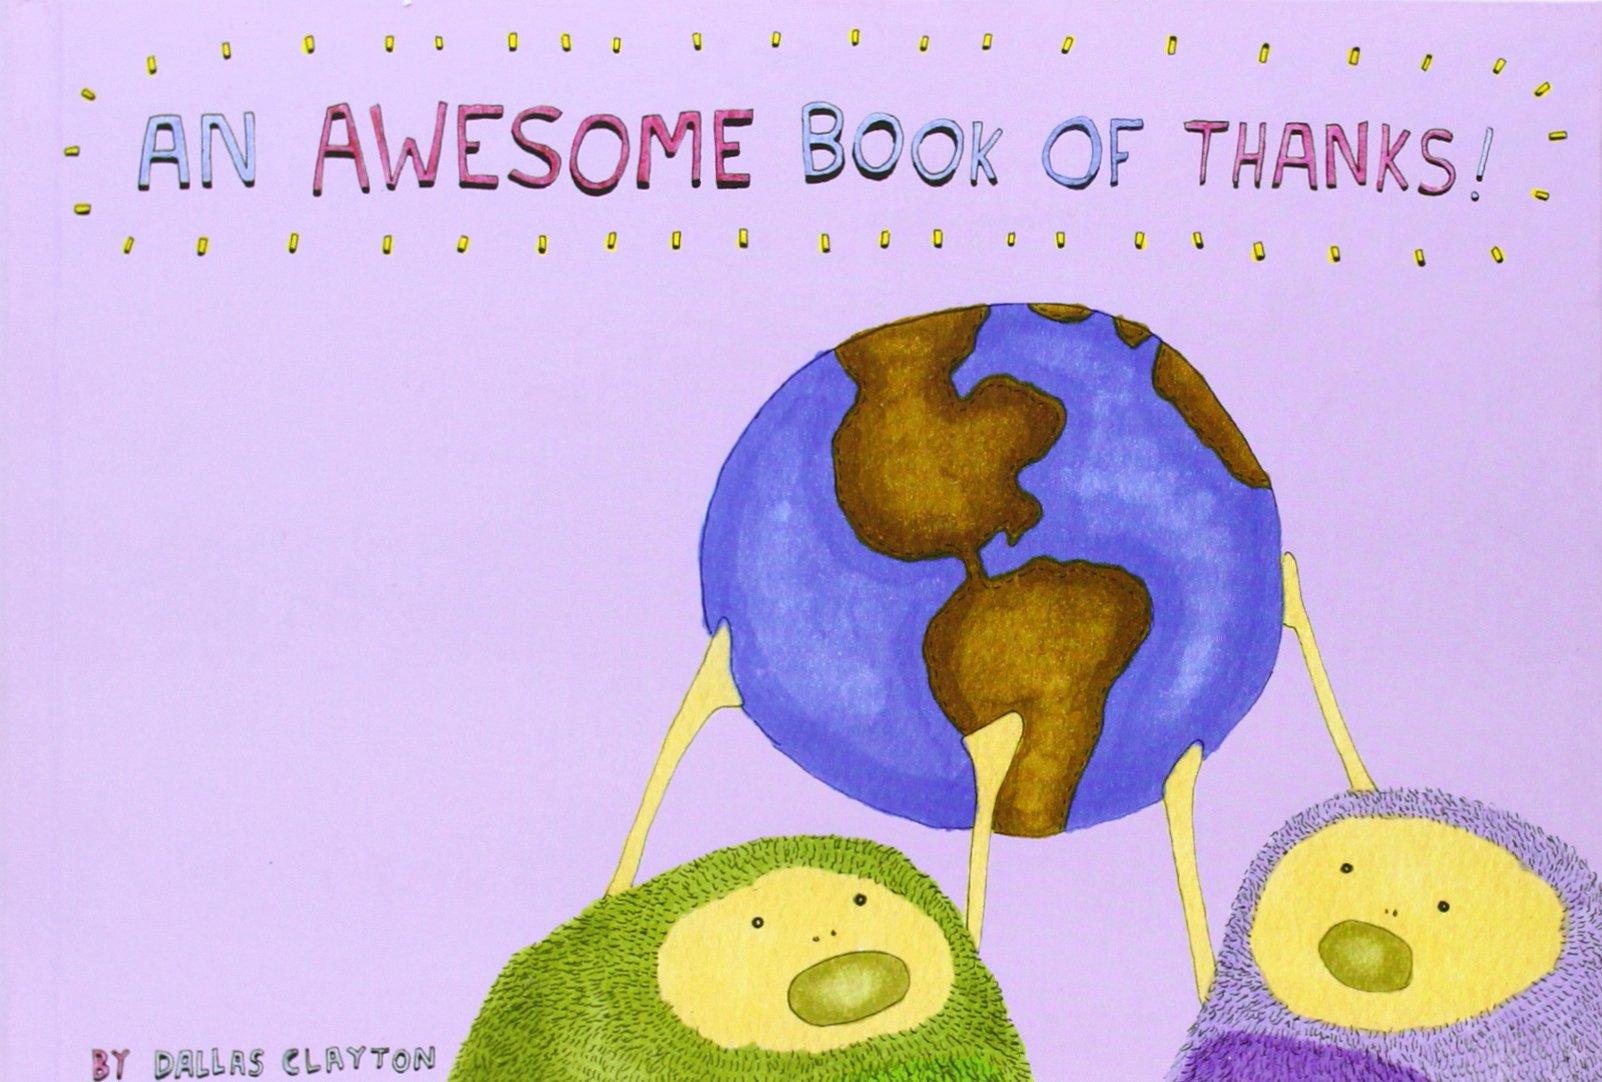 an awesome book of thanks dallas clayton dallas clayton an awesome book of thanks dallas clayton dallas clayton 9781935597377 com books